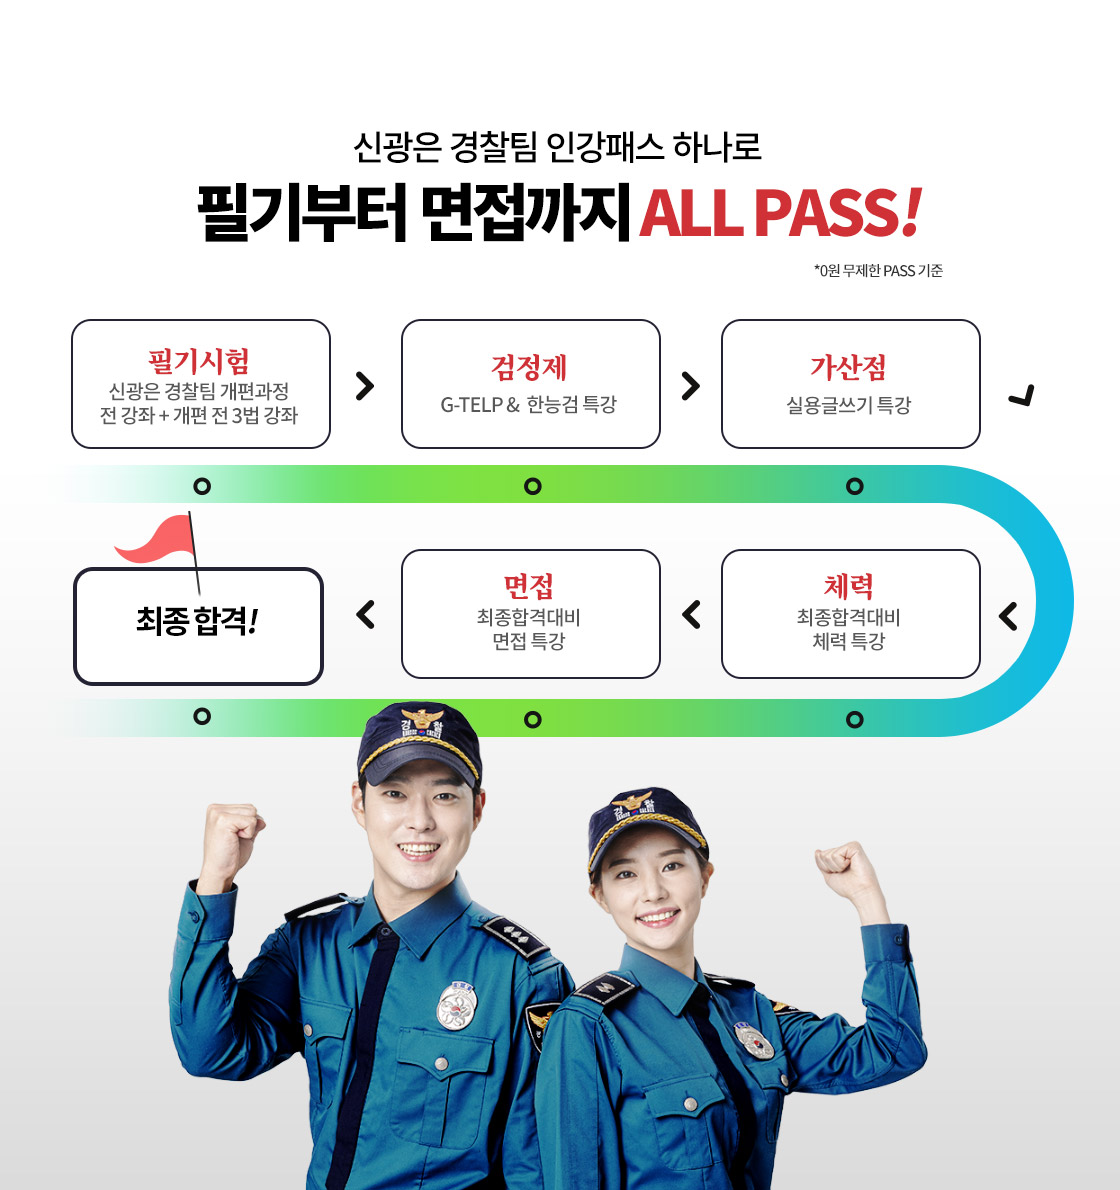 all pass